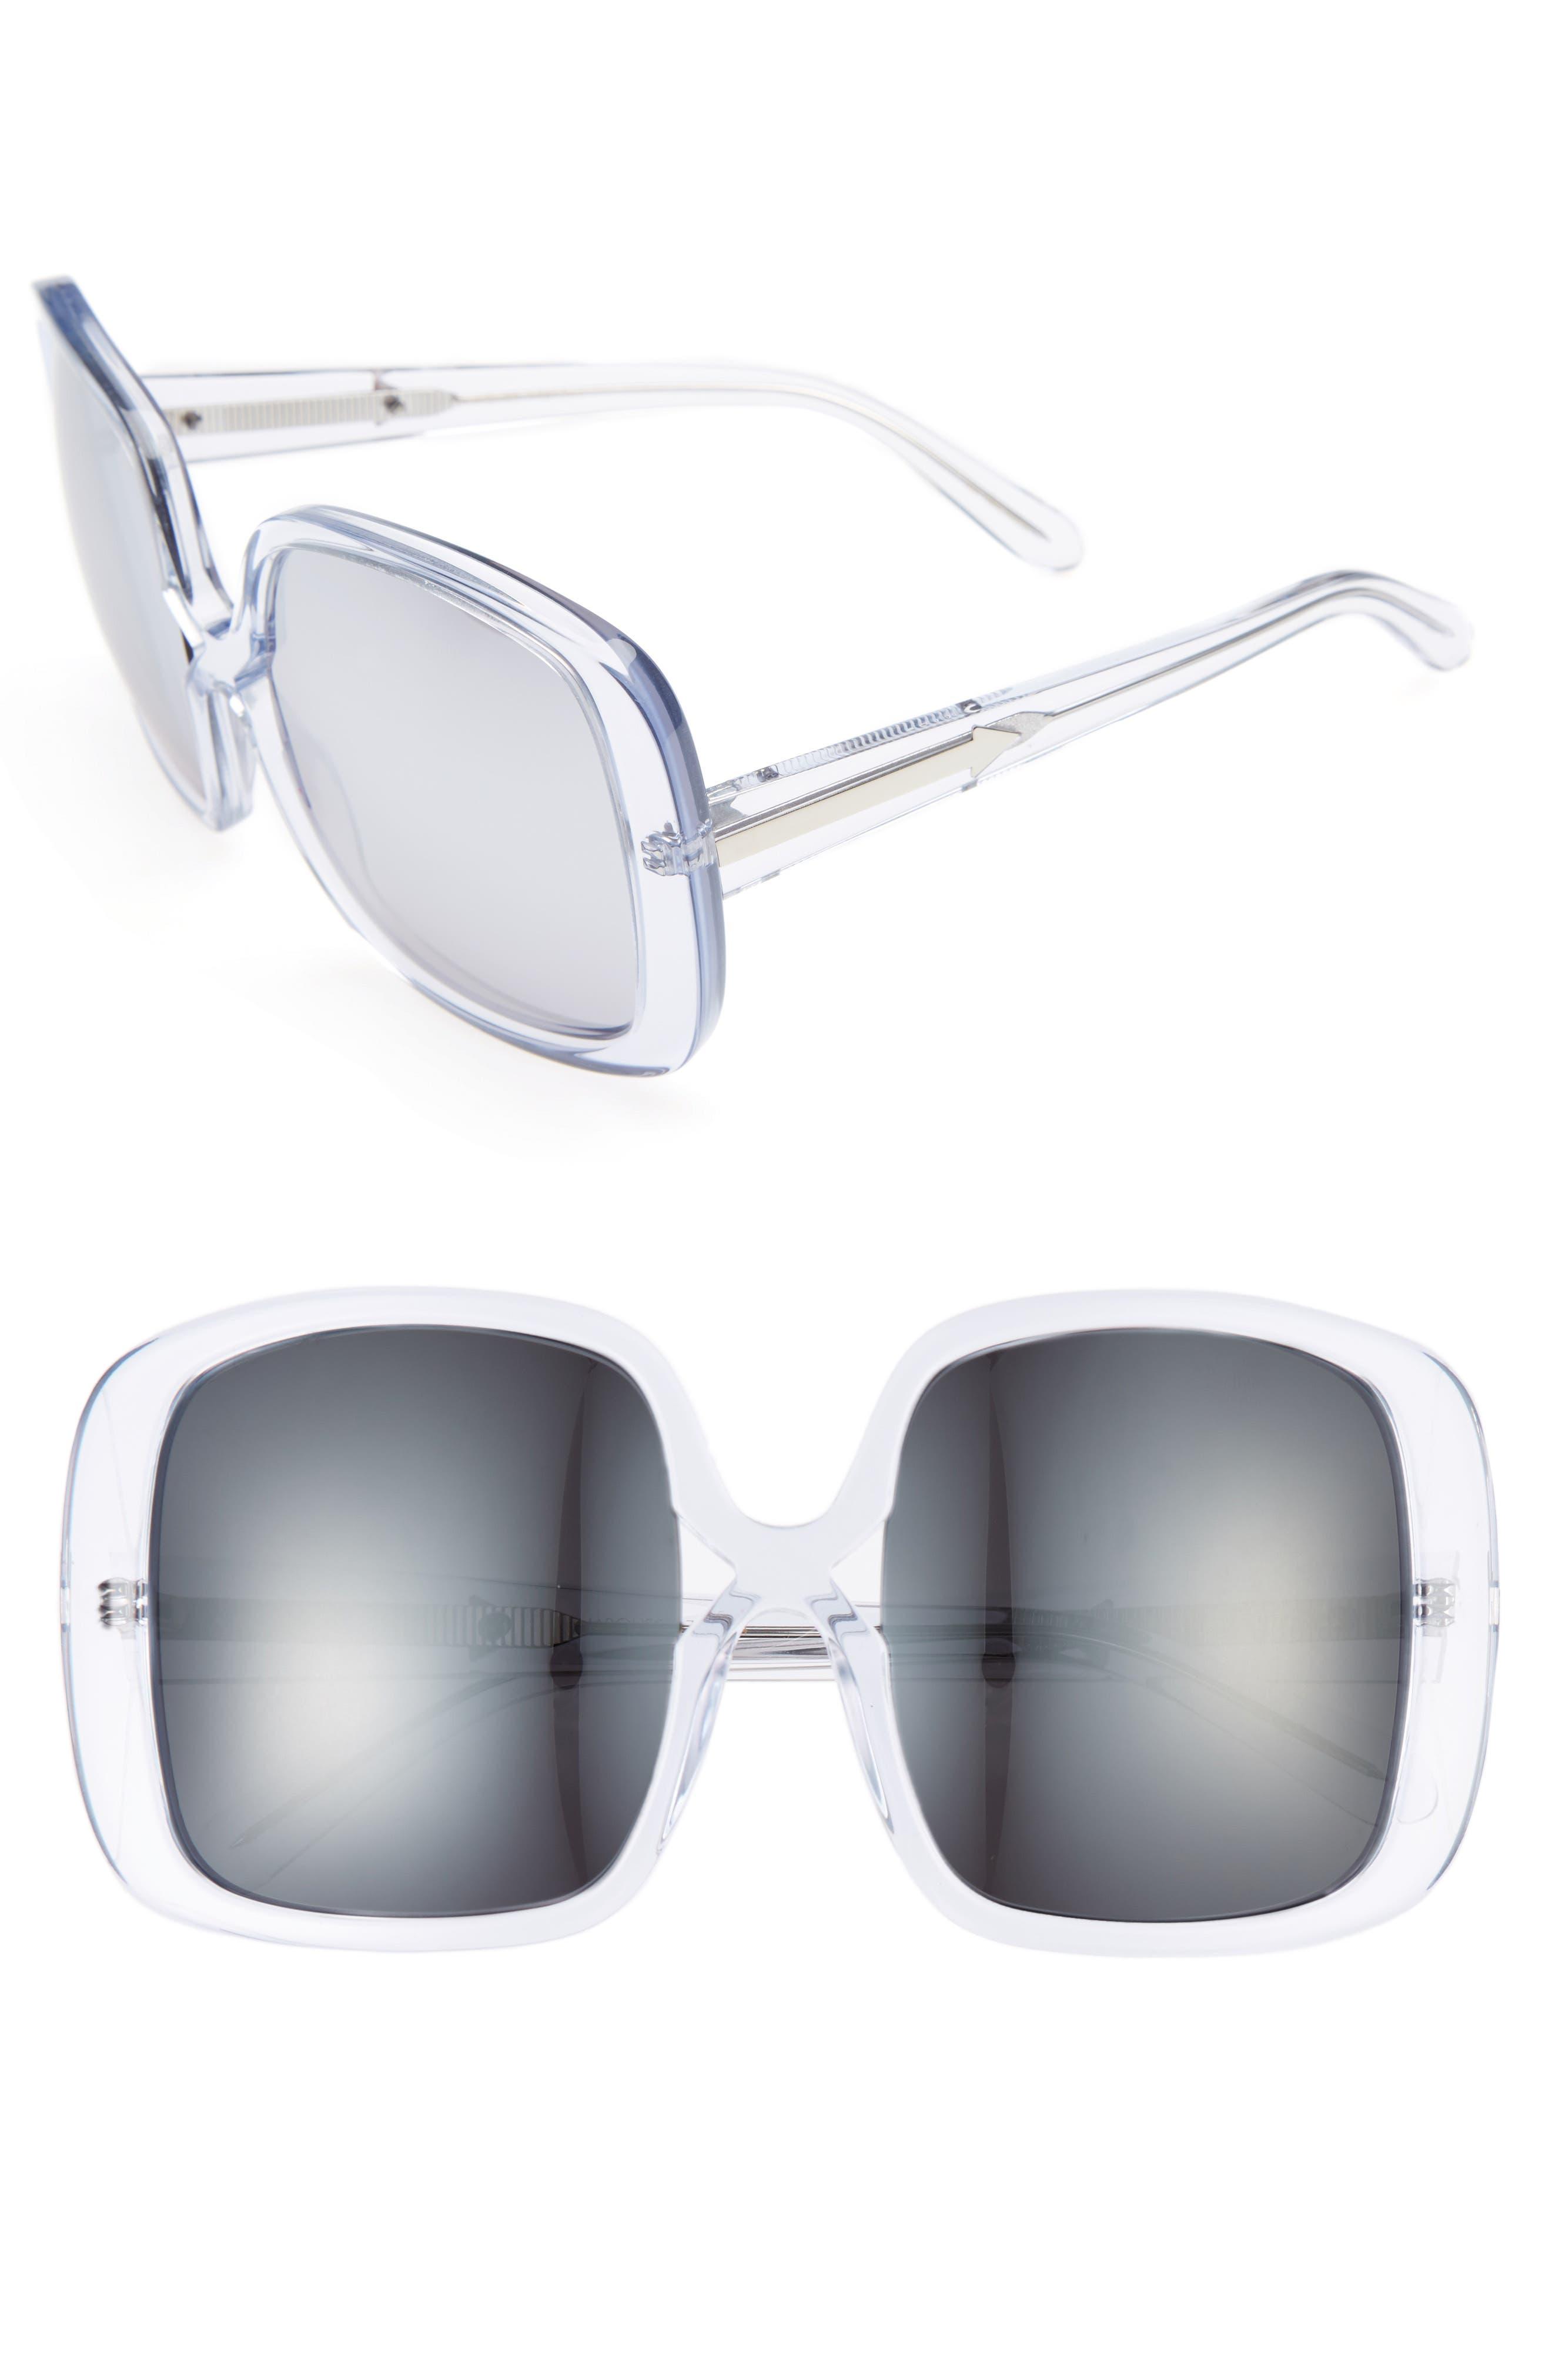 Marques 55mm Square Sunglasses,                             Main thumbnail 1, color,                             040